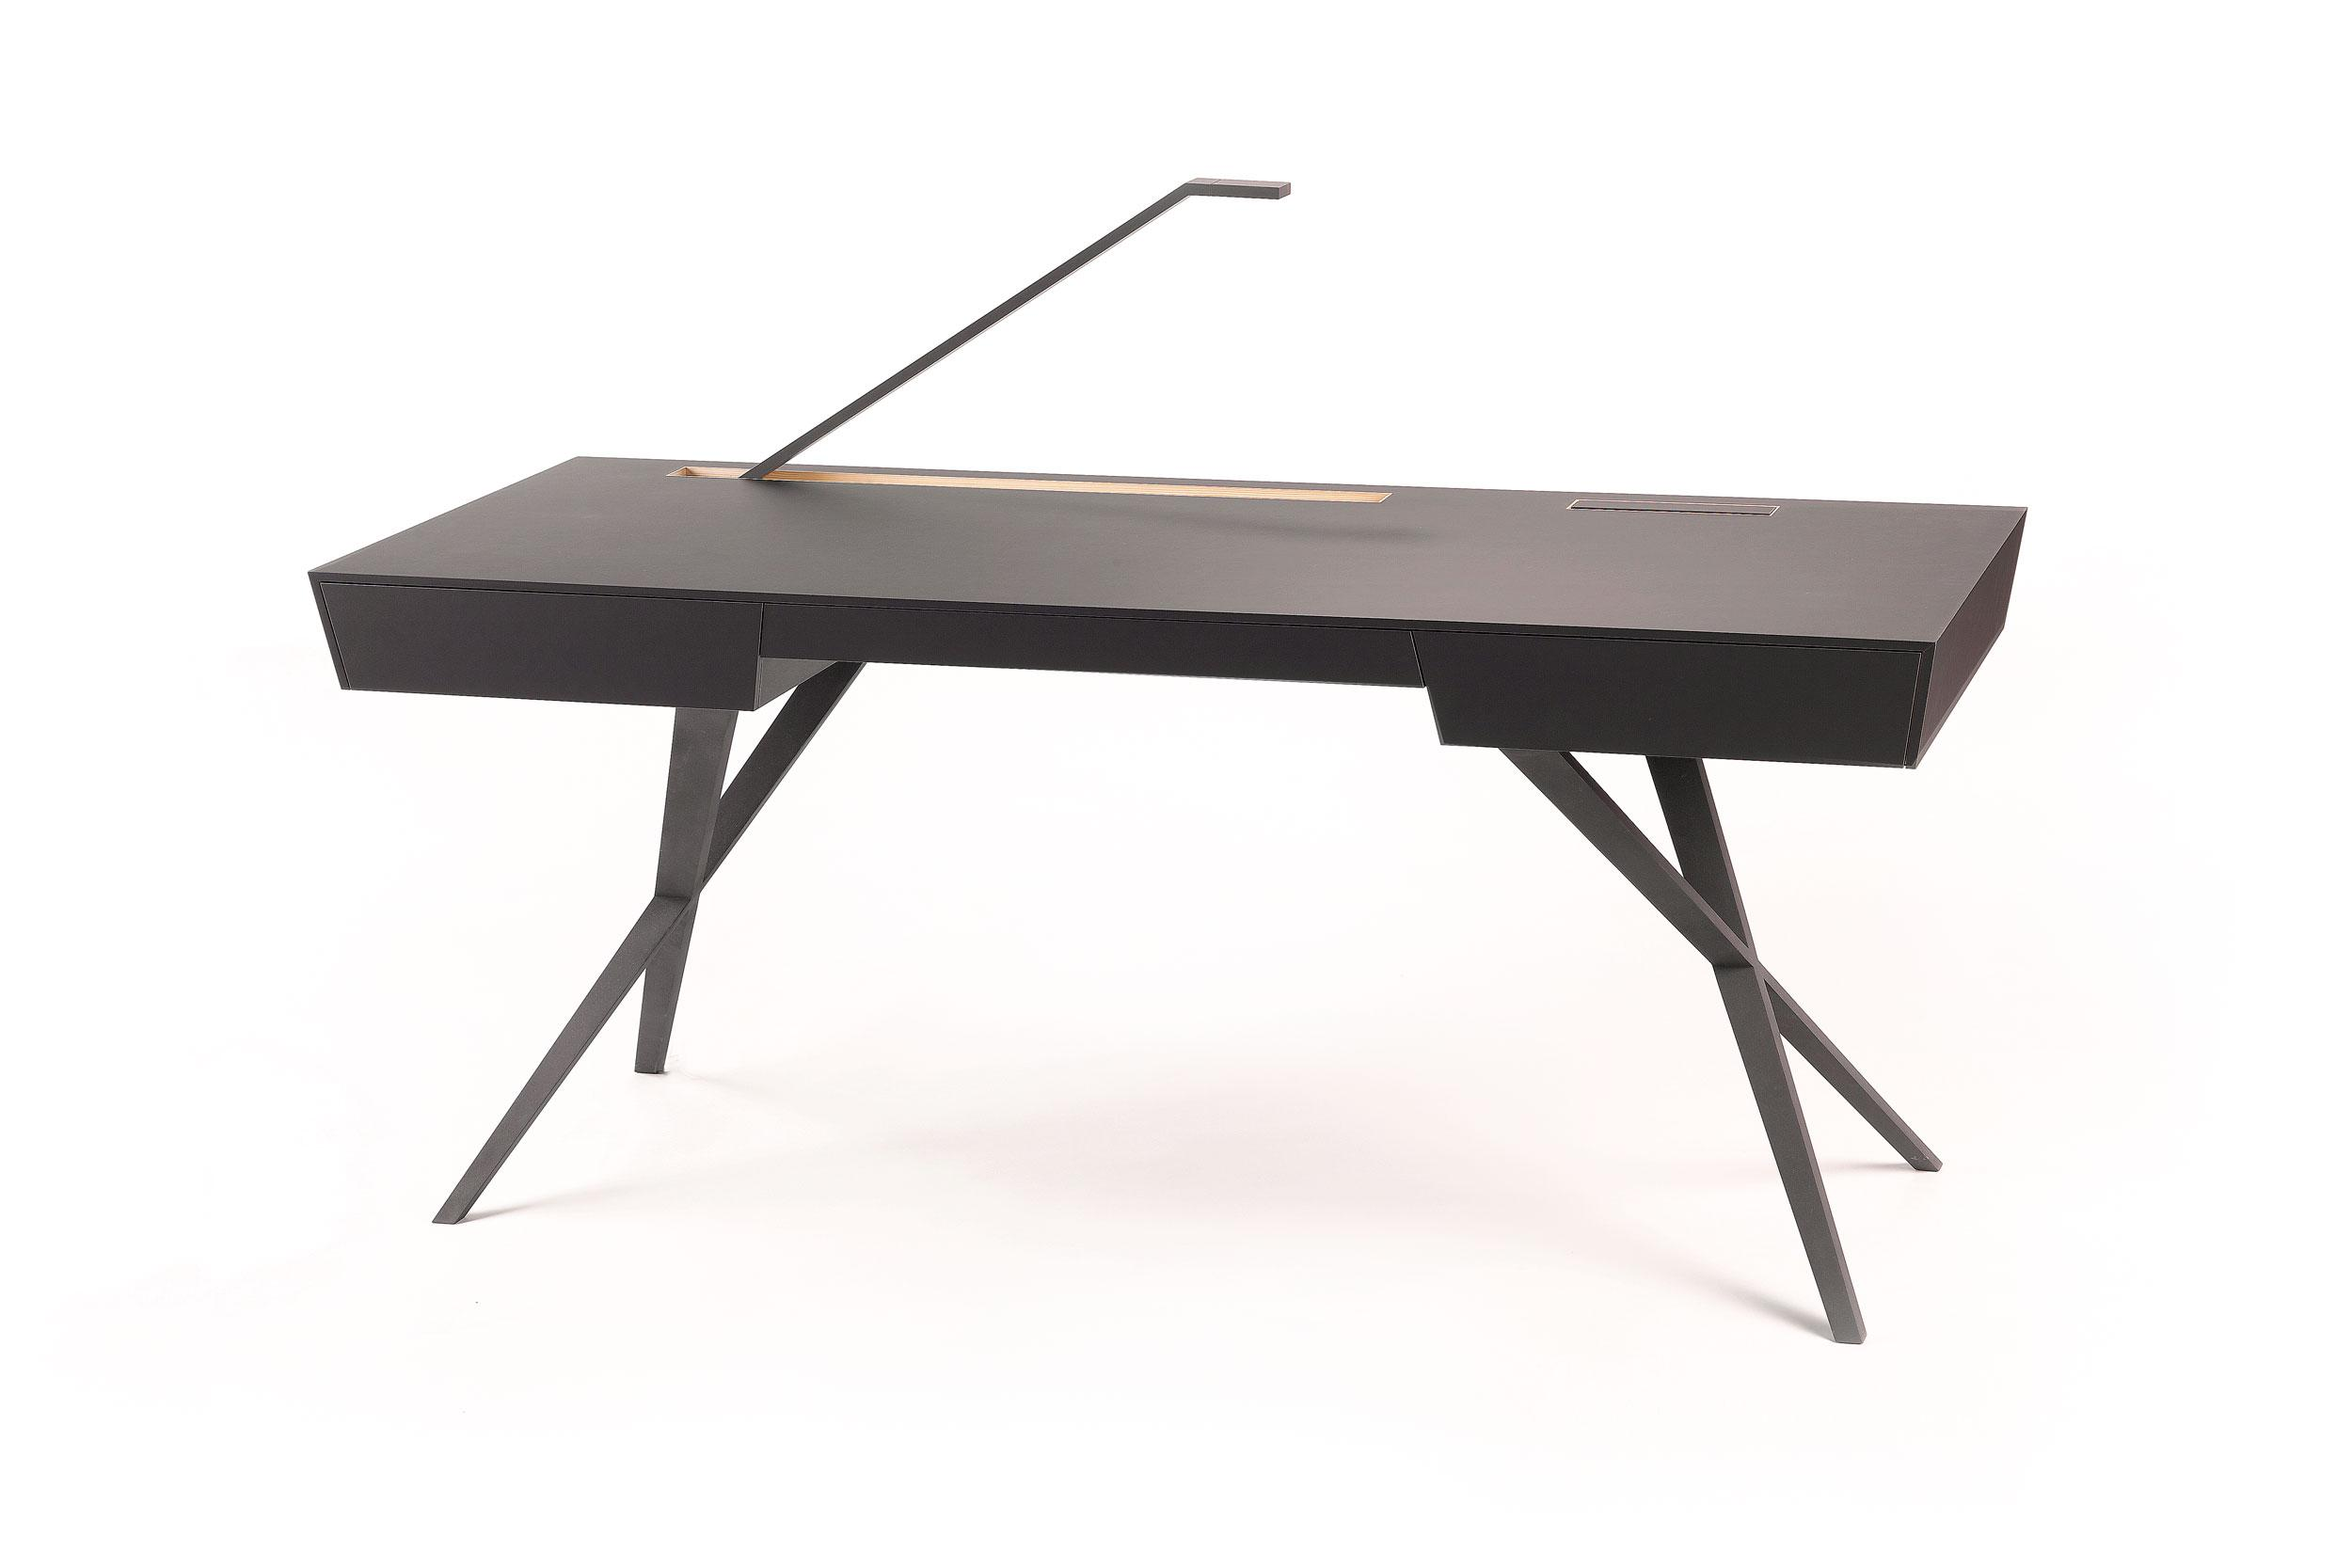 Sebastian Kottmair | Gestaltung & Handwerk